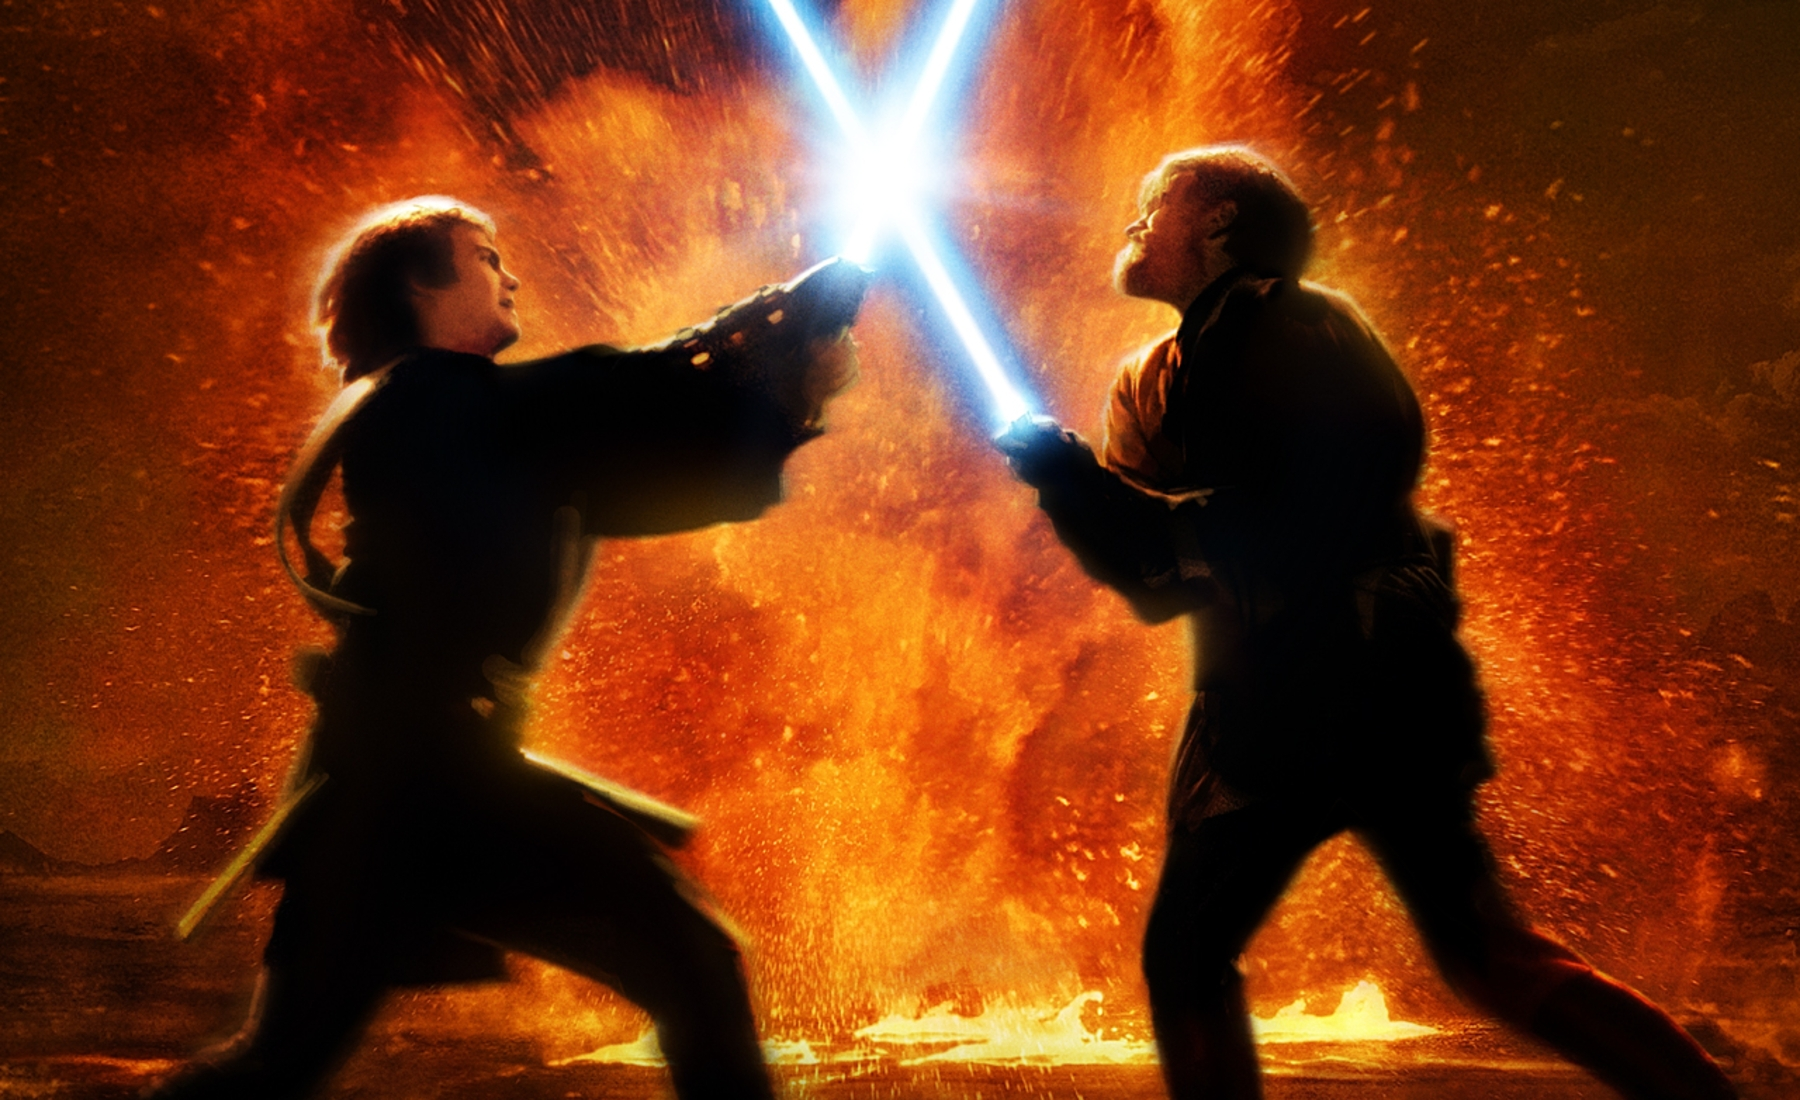 The Best Star Wars Lightsaber Battles The Mad Movie Man